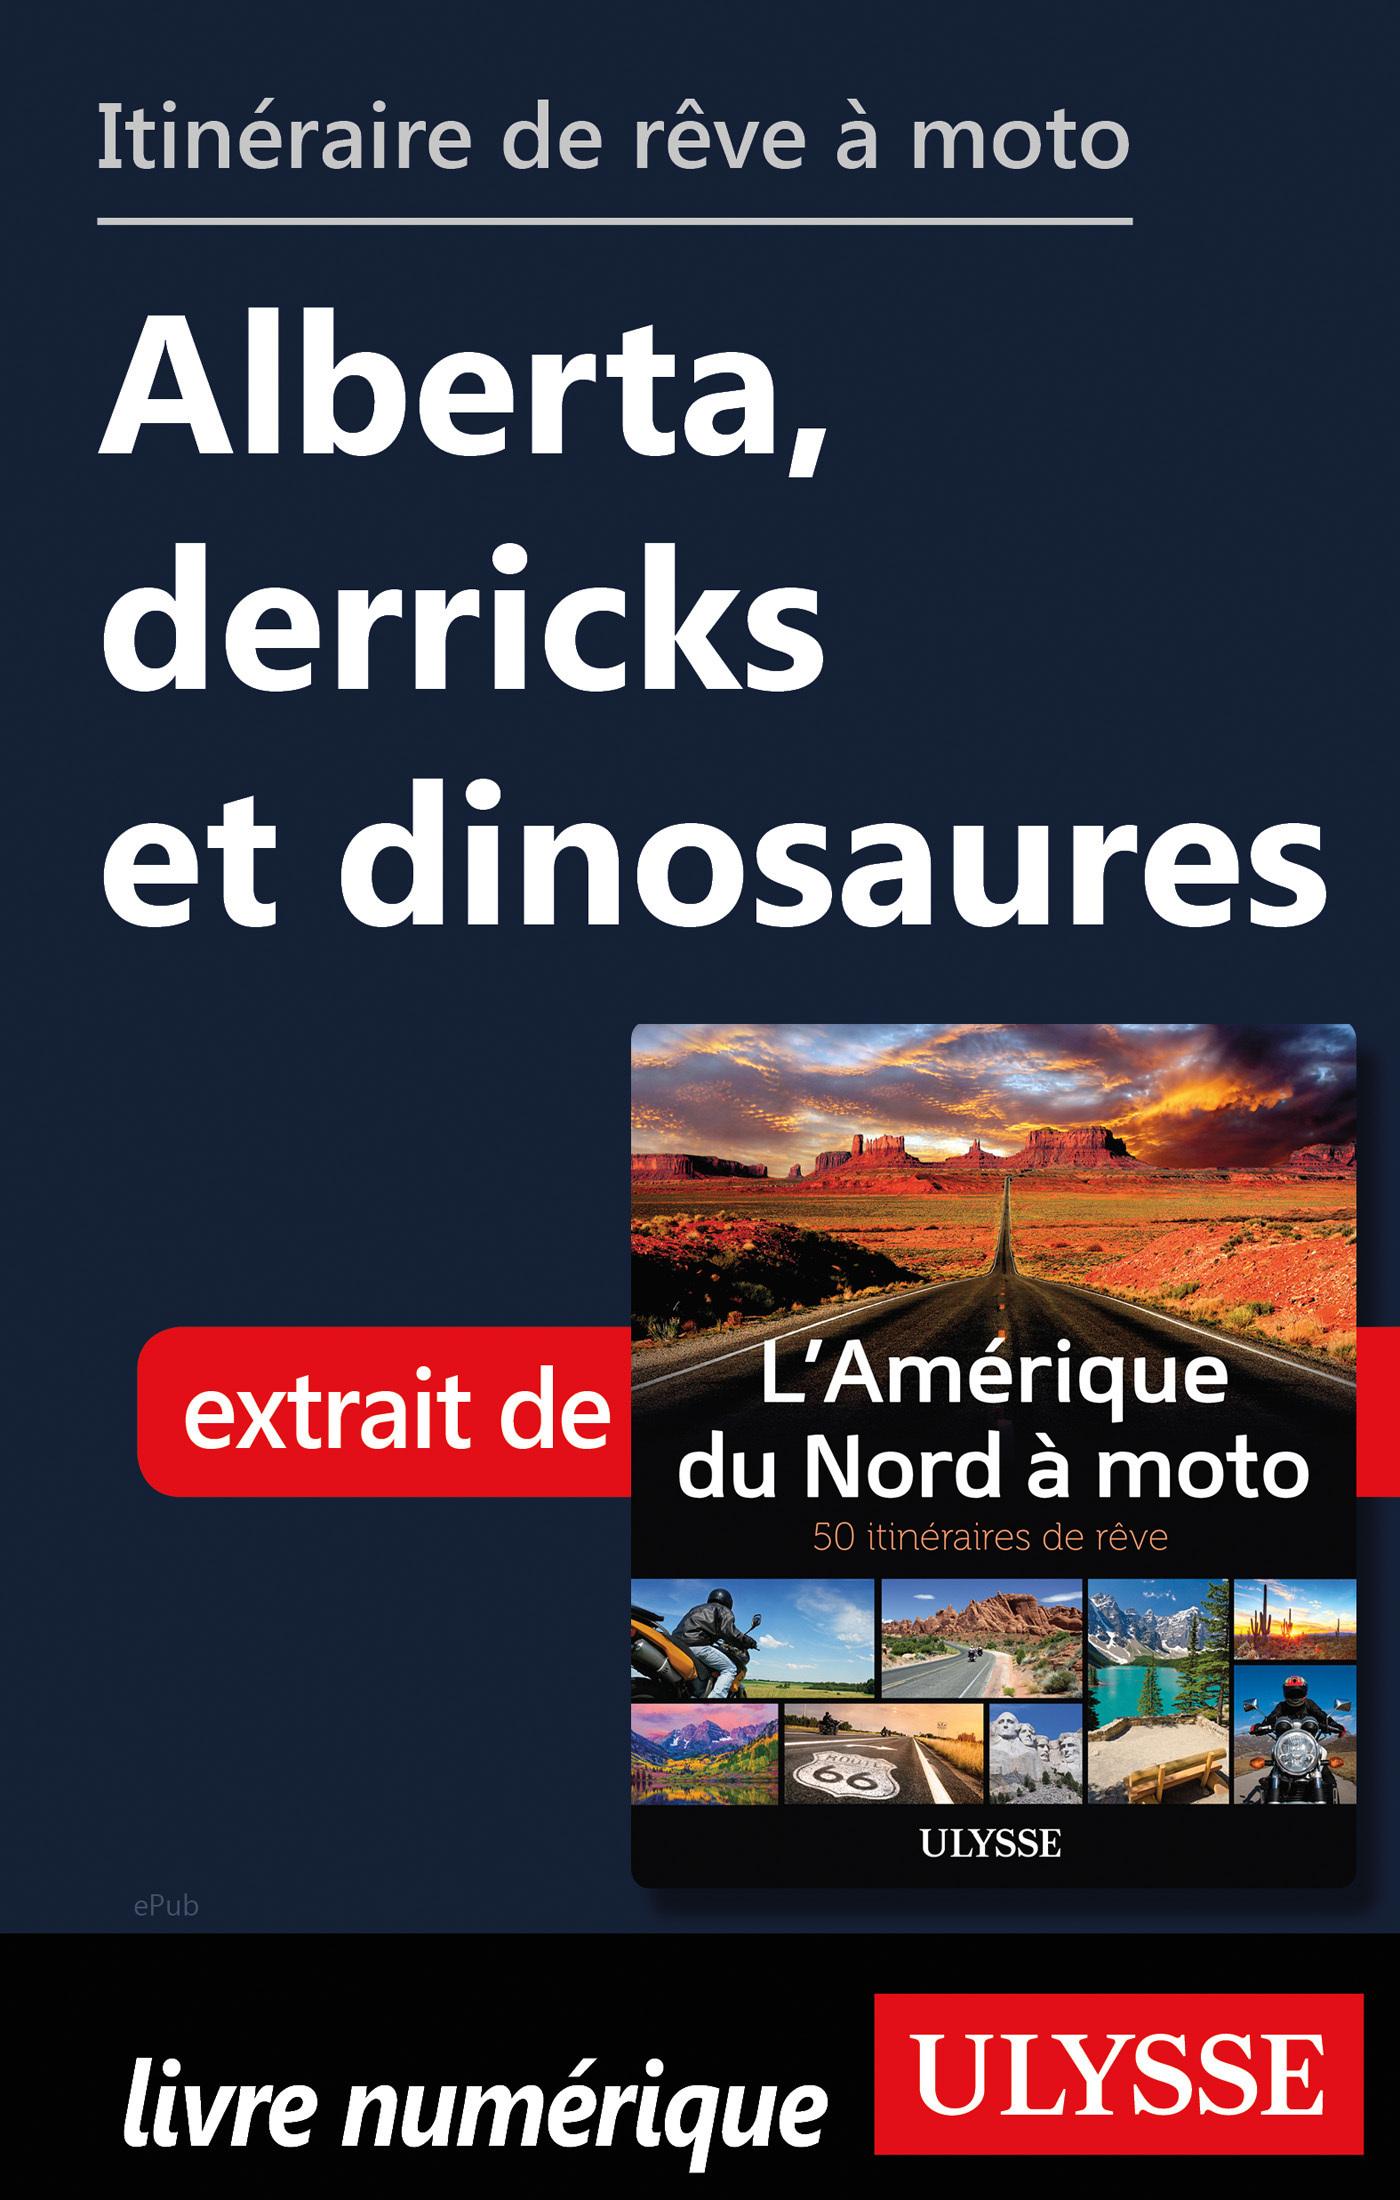 Itinéraire de rêve à moto - Alberta, derricks et dinosaures